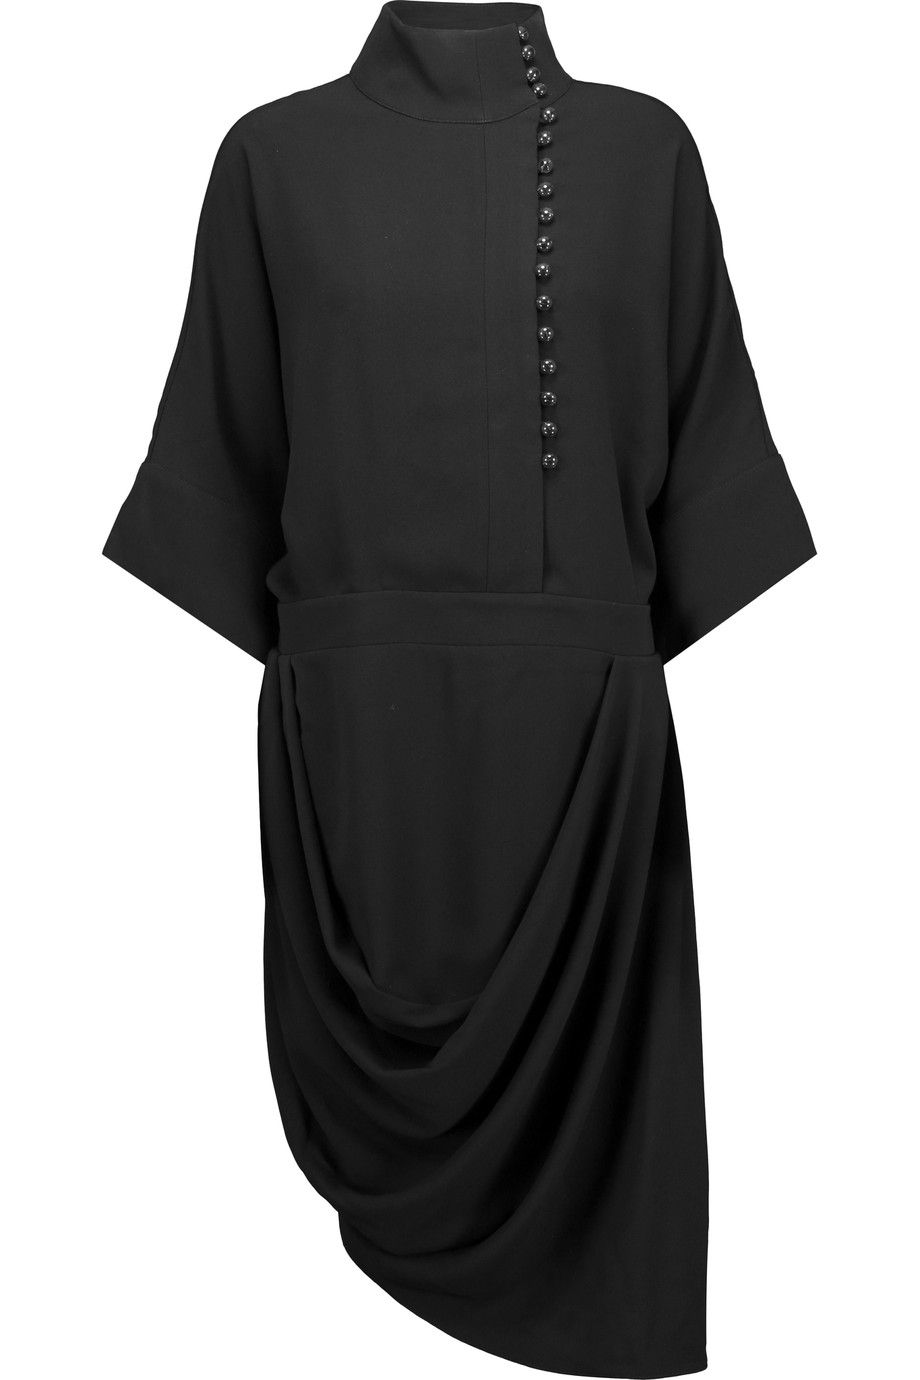 Draped Asymmetric Crepe Dress Designer Clothes Sale Crepe Dress Discount Designer Clothes